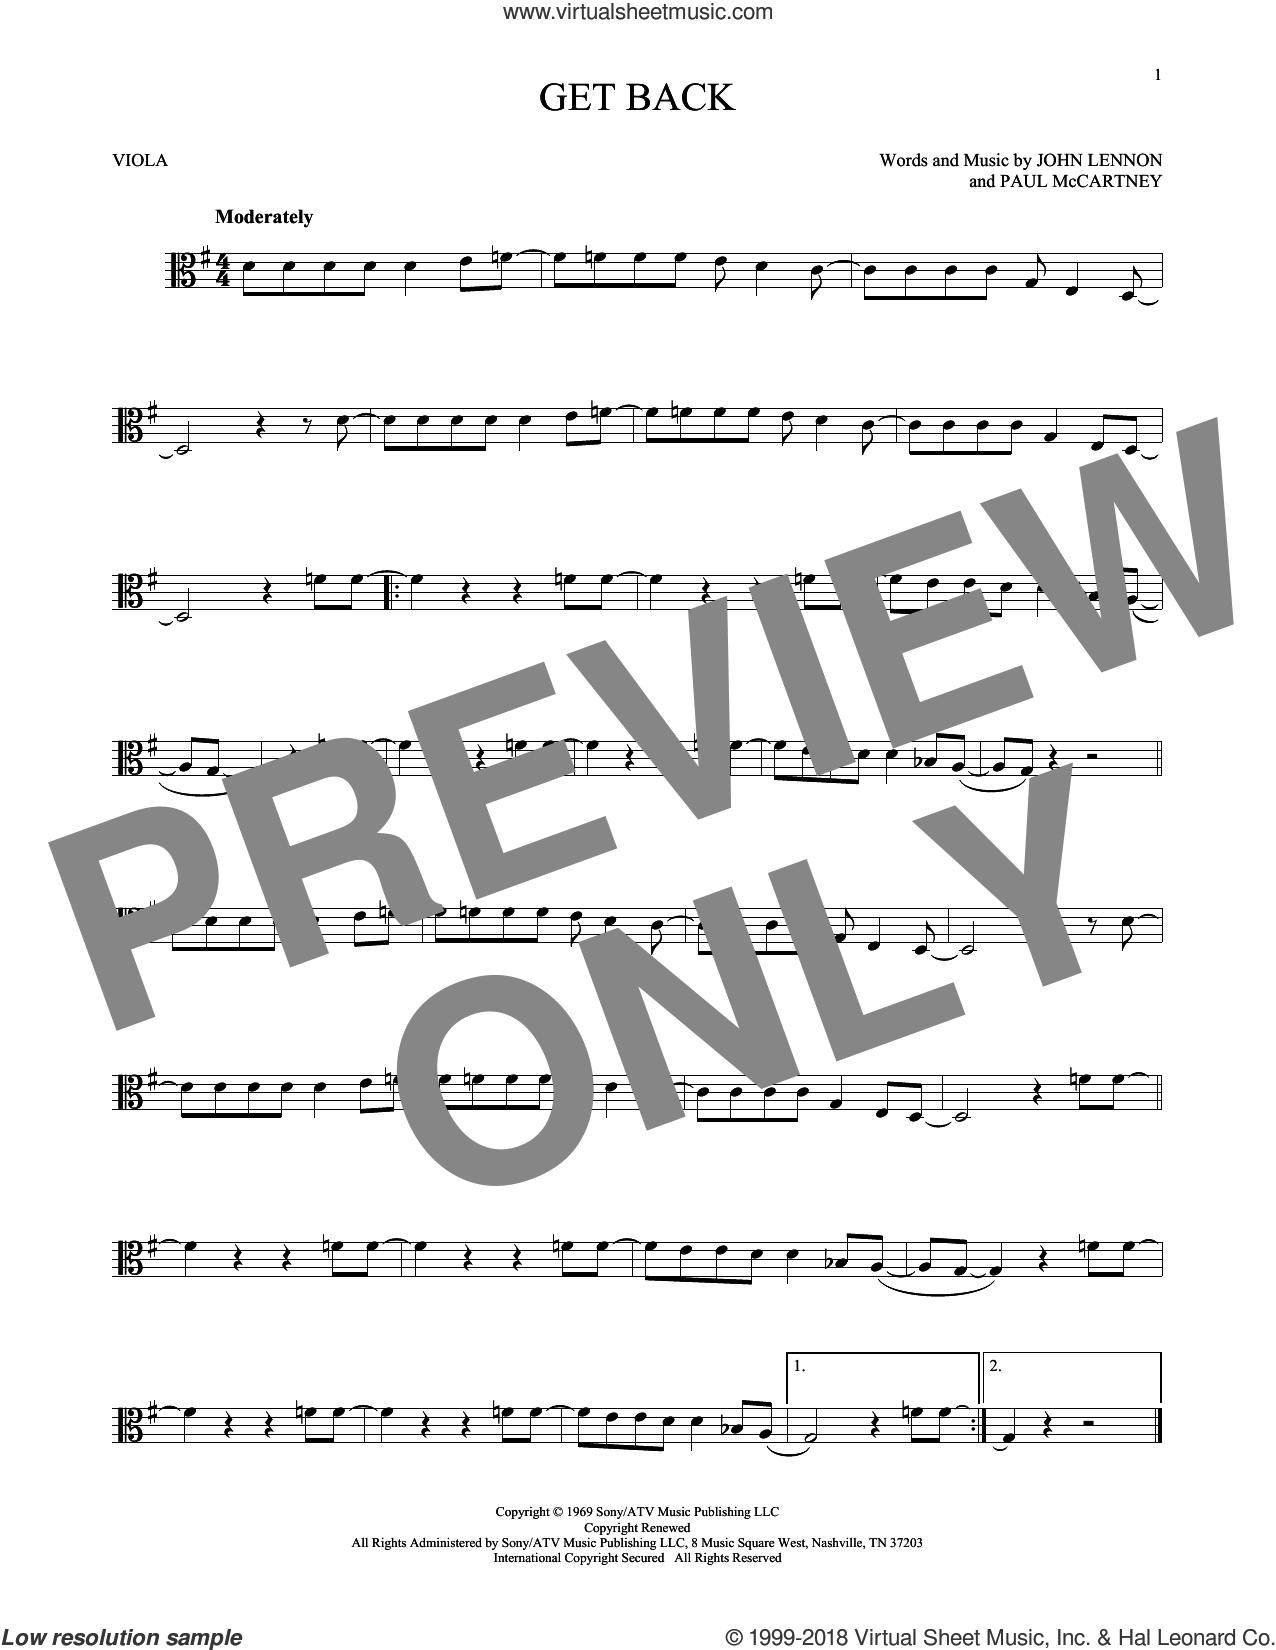 Get Back sheet music for viola solo by The Beatles, John Lennon and Paul McCartney, intermediate skill level